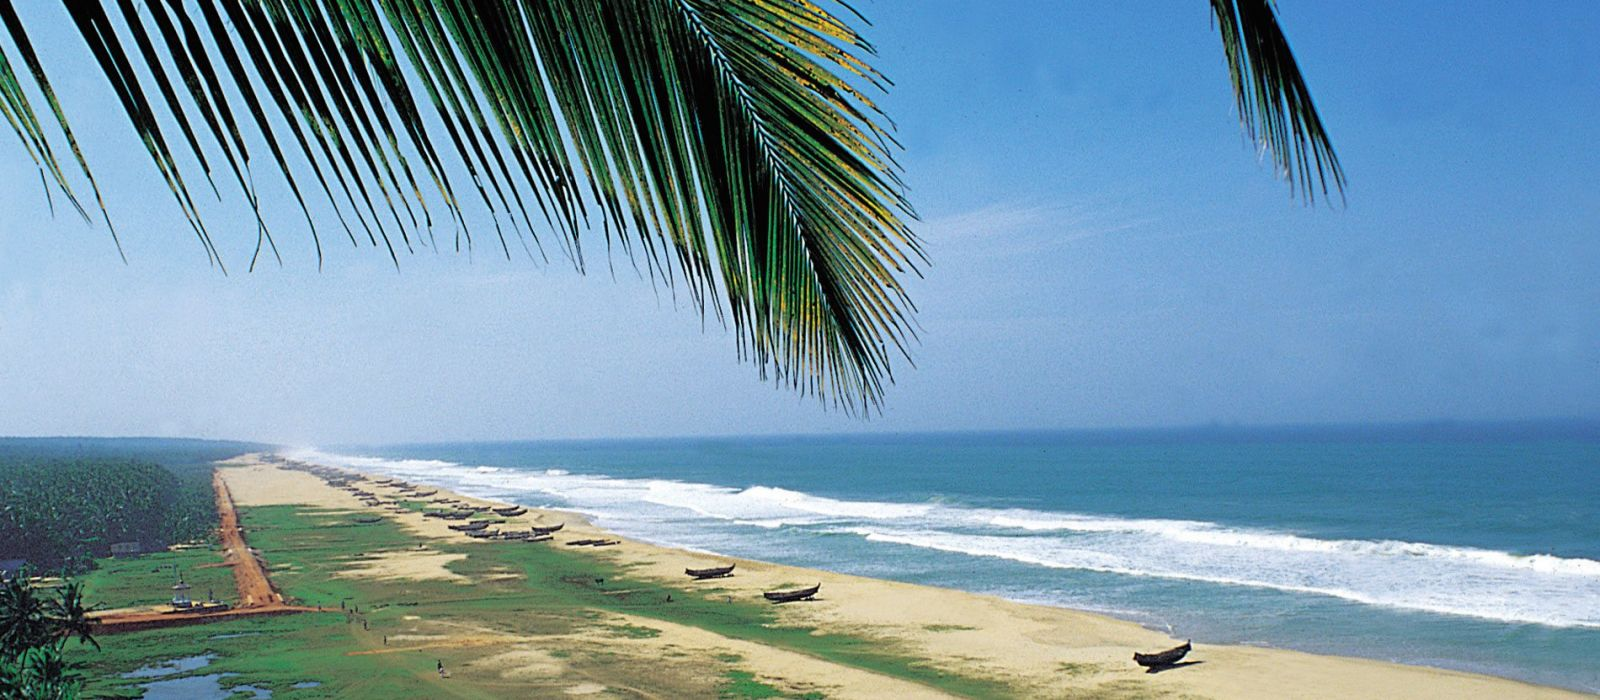 Destination Trivandrum Islands & Beaches